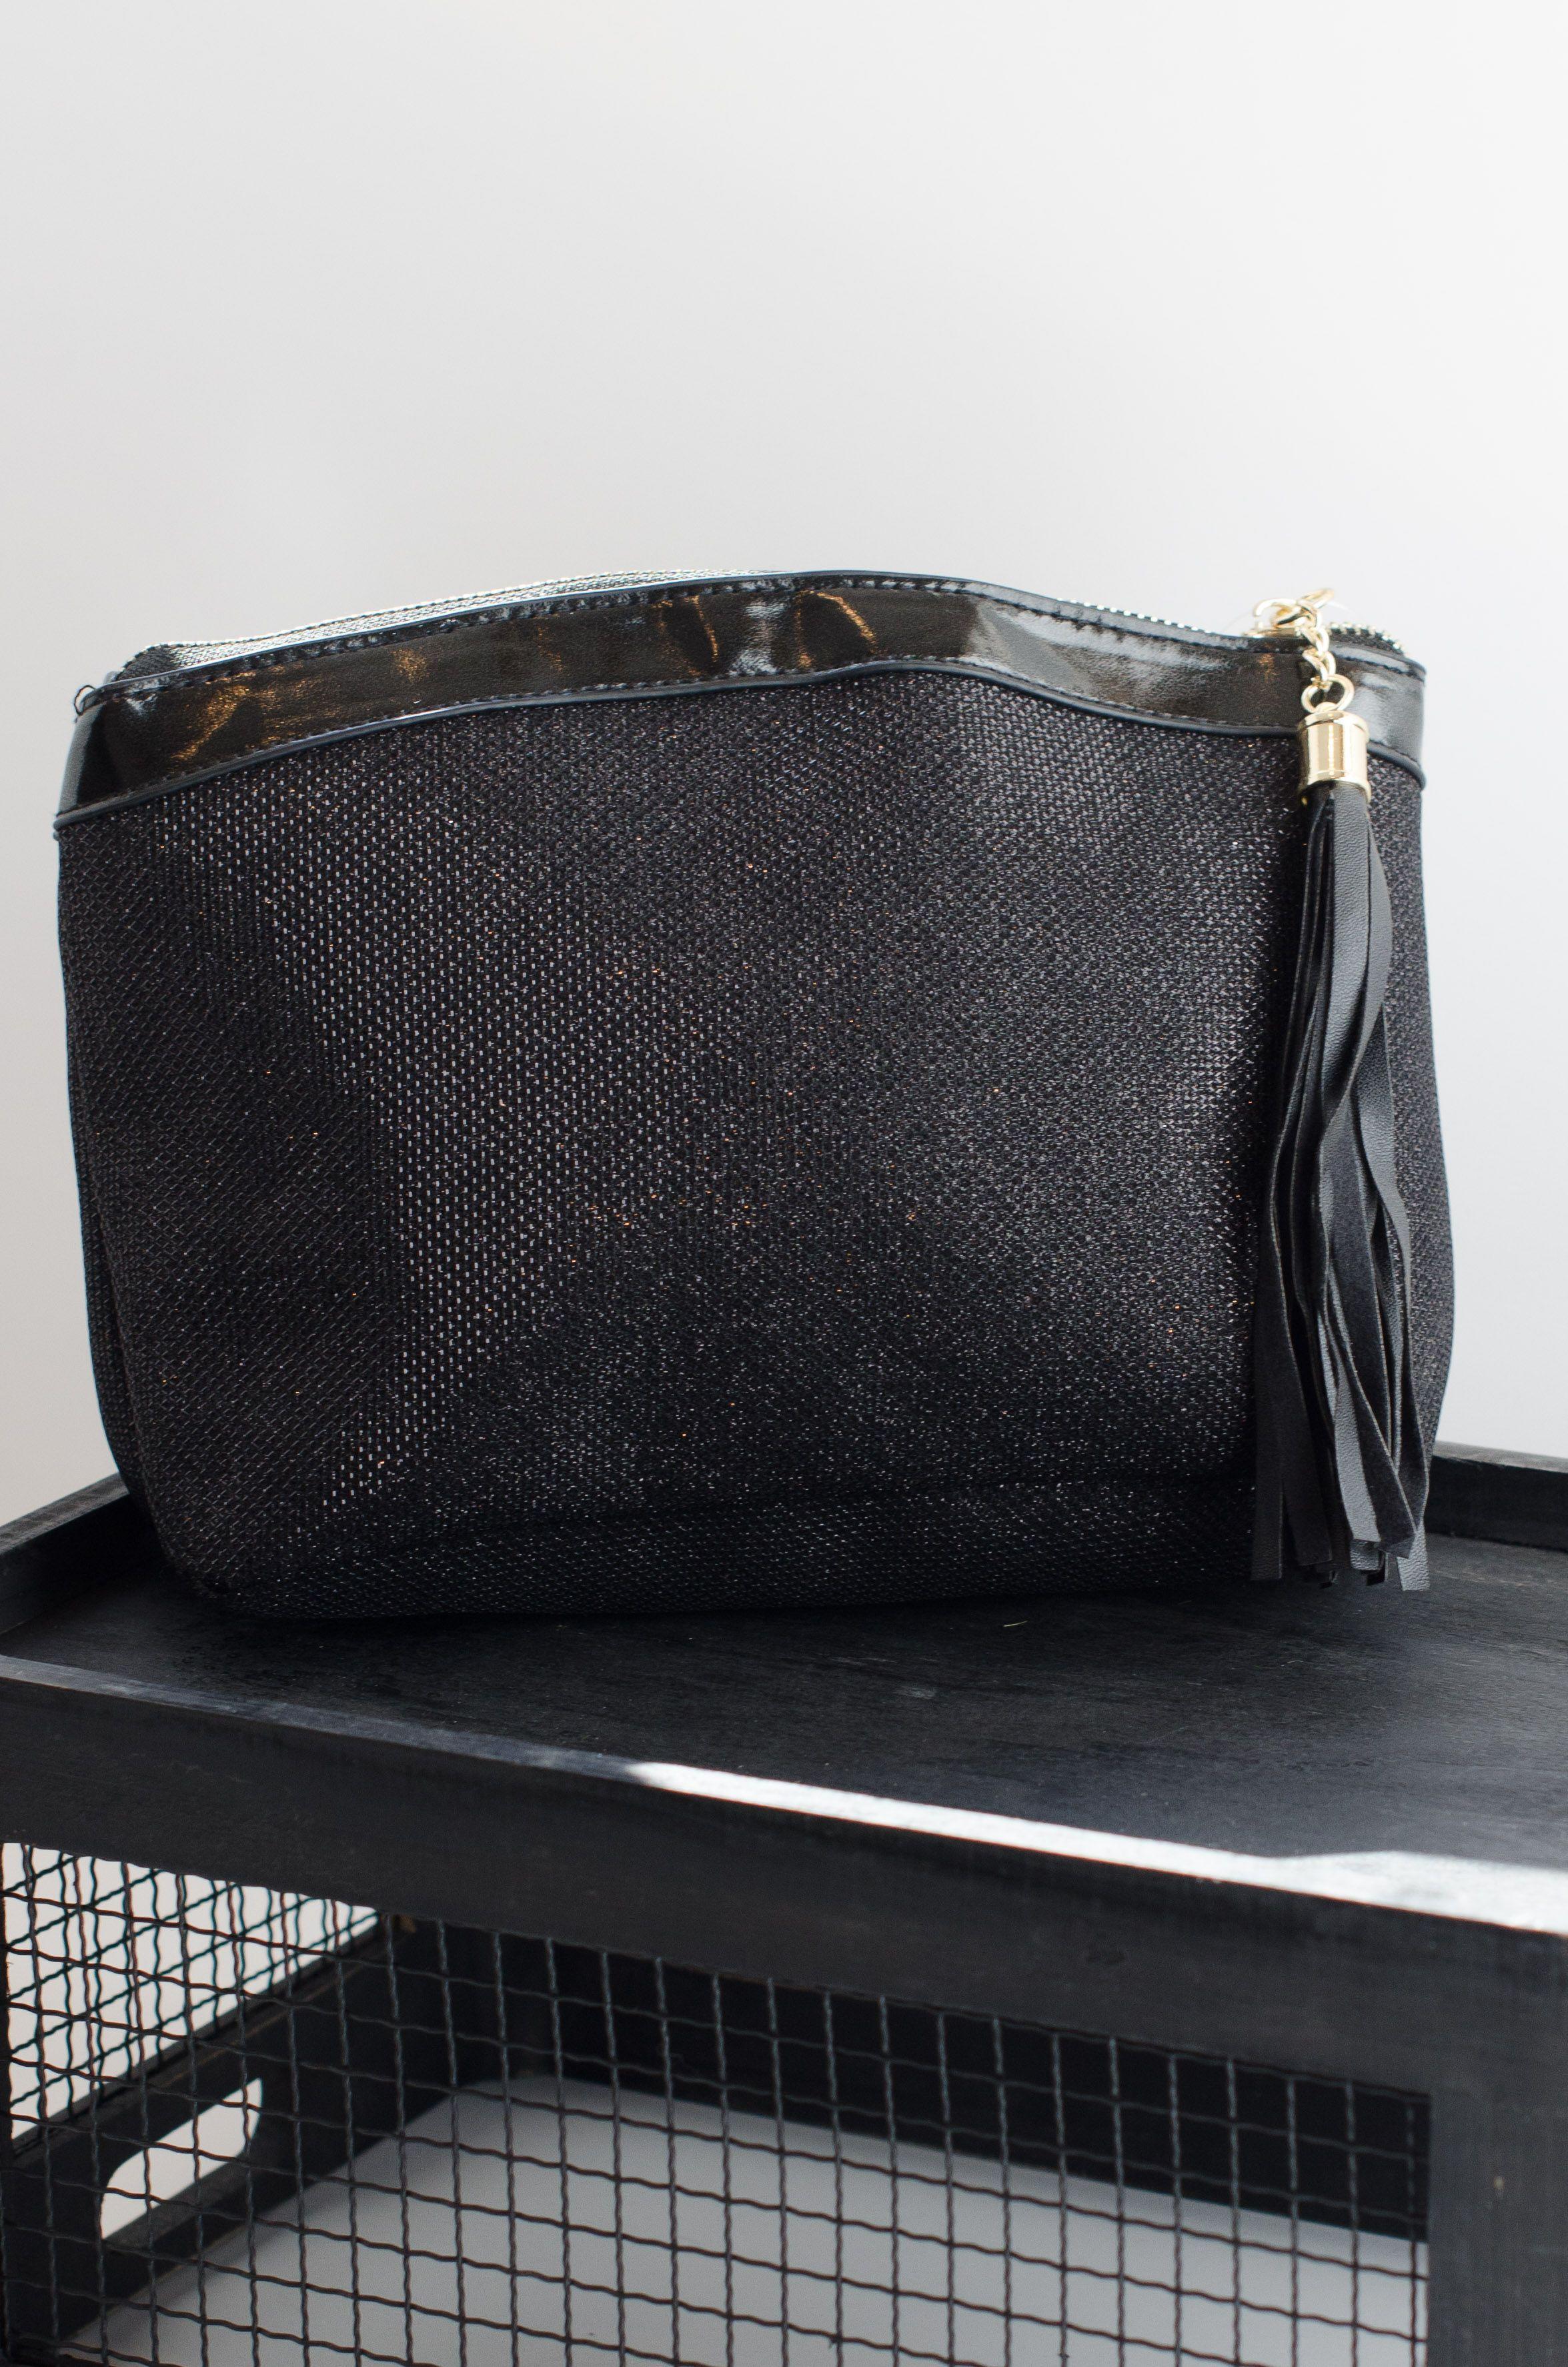 black cosmetic makeup bag. great for bridesmaid gift